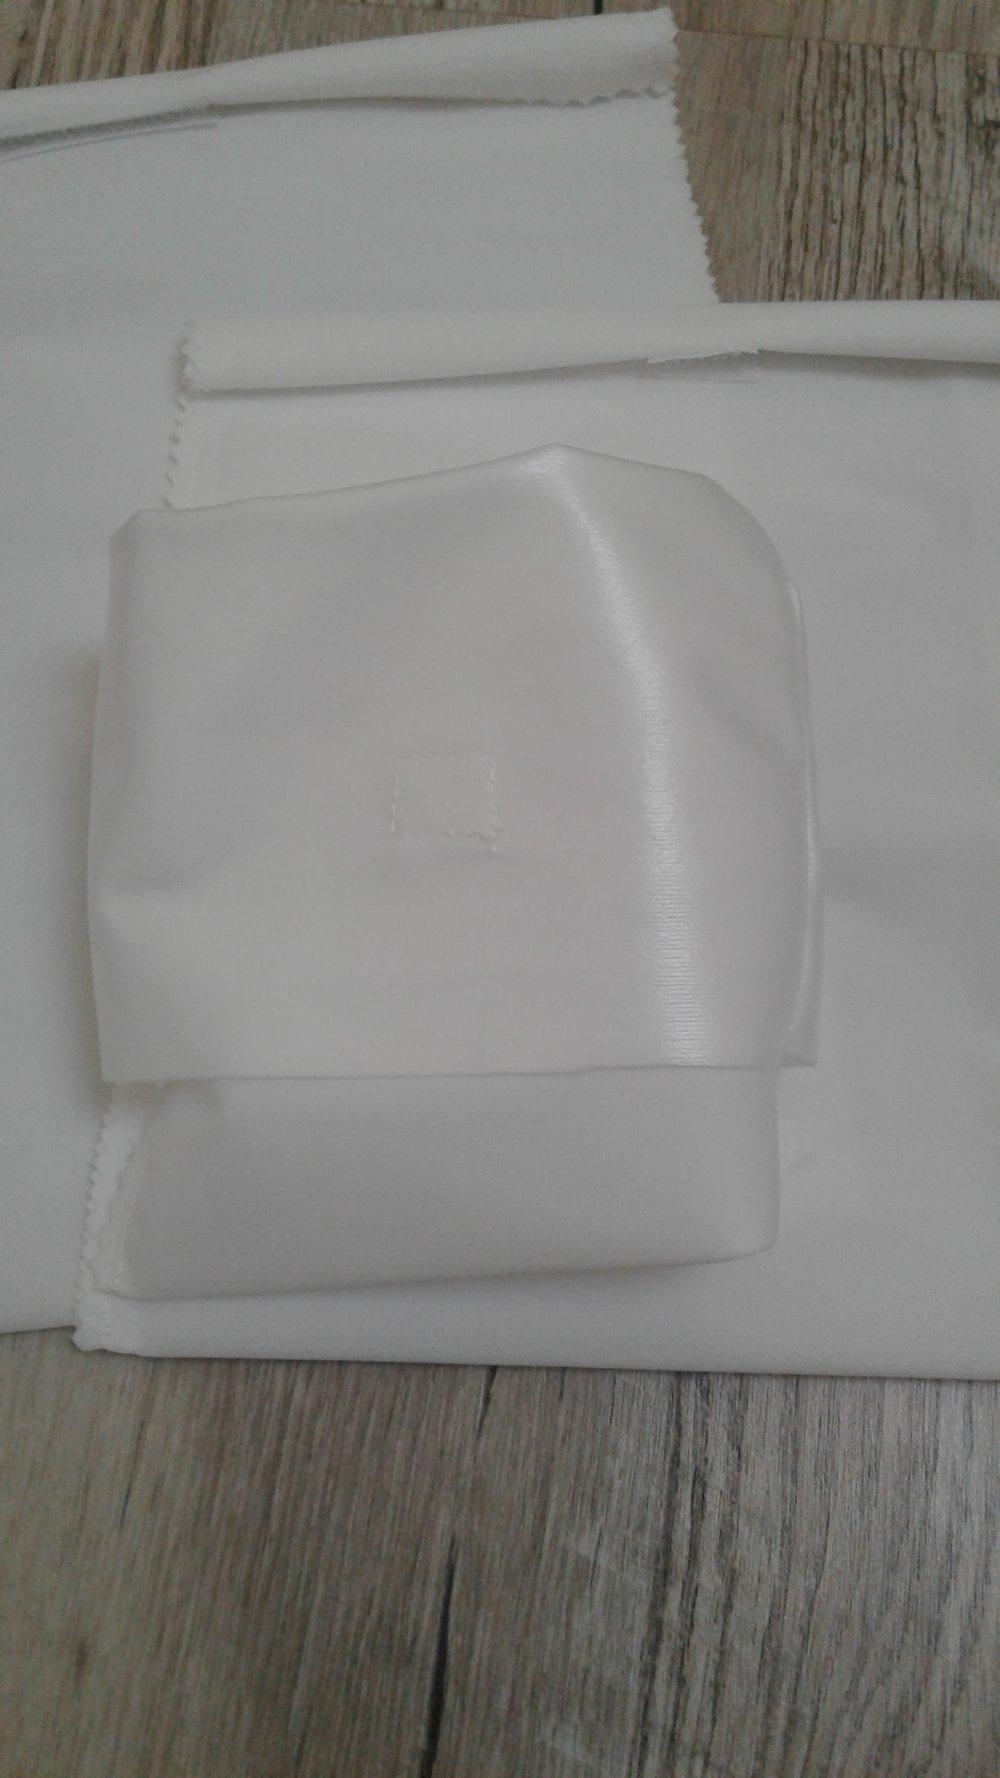 sacs congélation lavable tissu oekotex